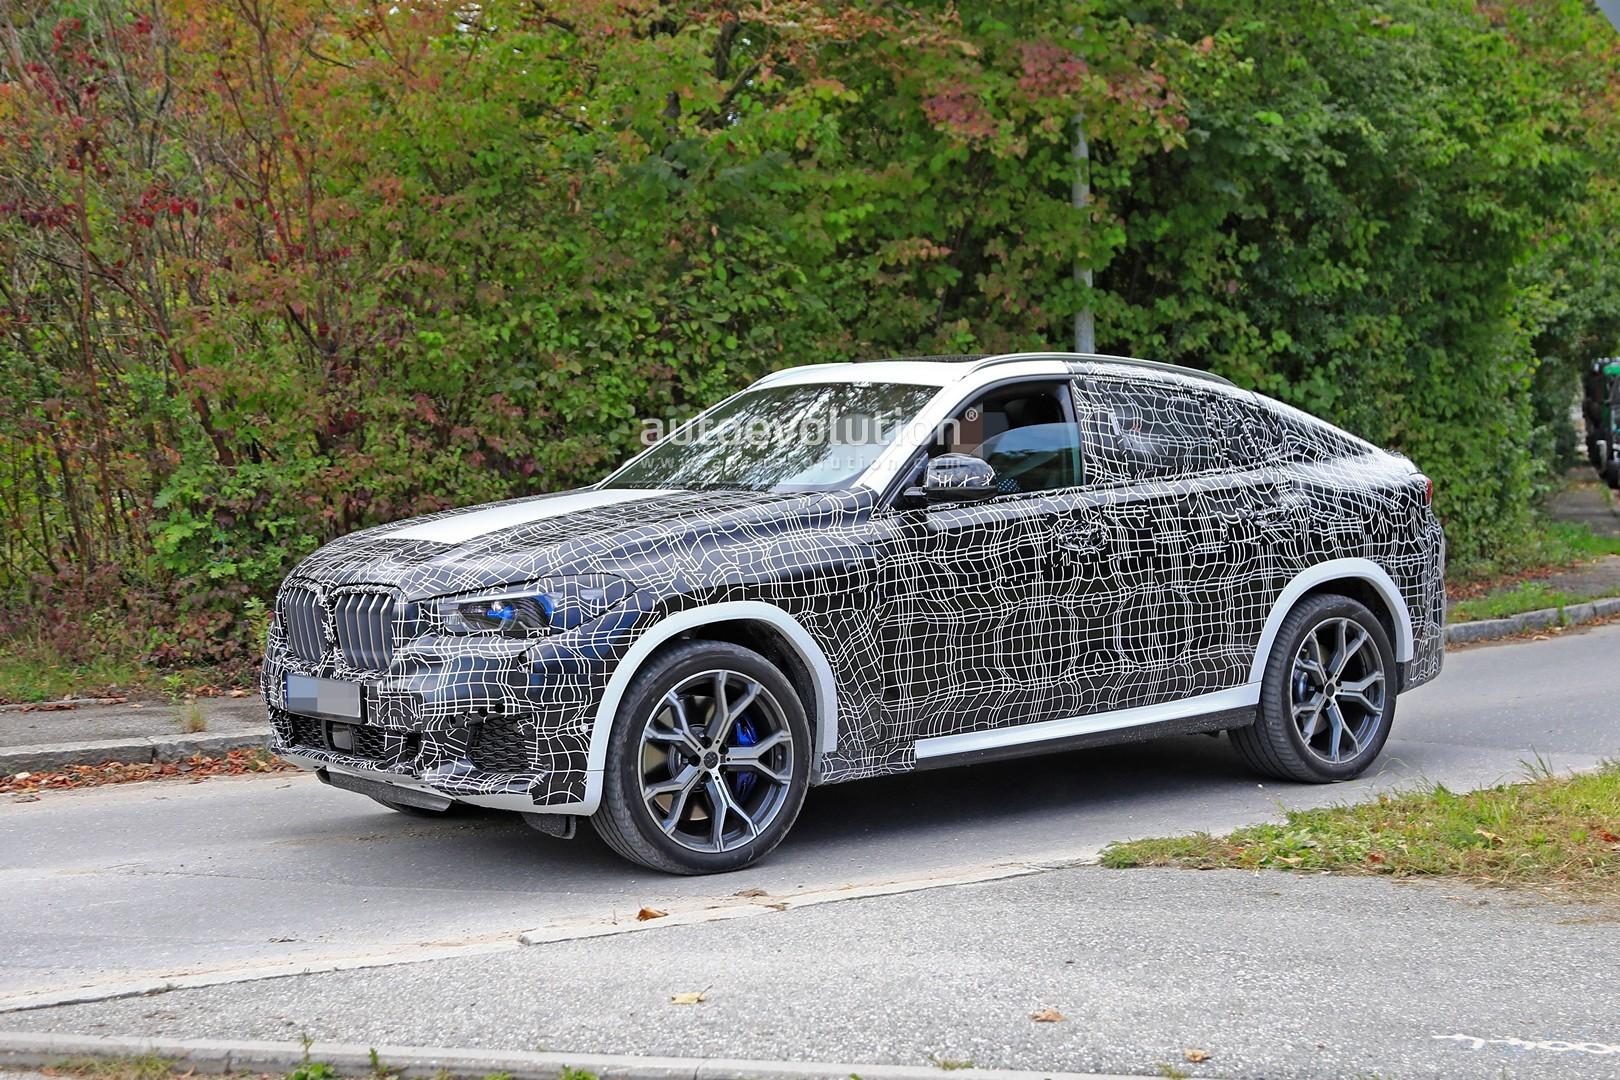 BMW X6: Svelte Crossover Gets Big Upgrades